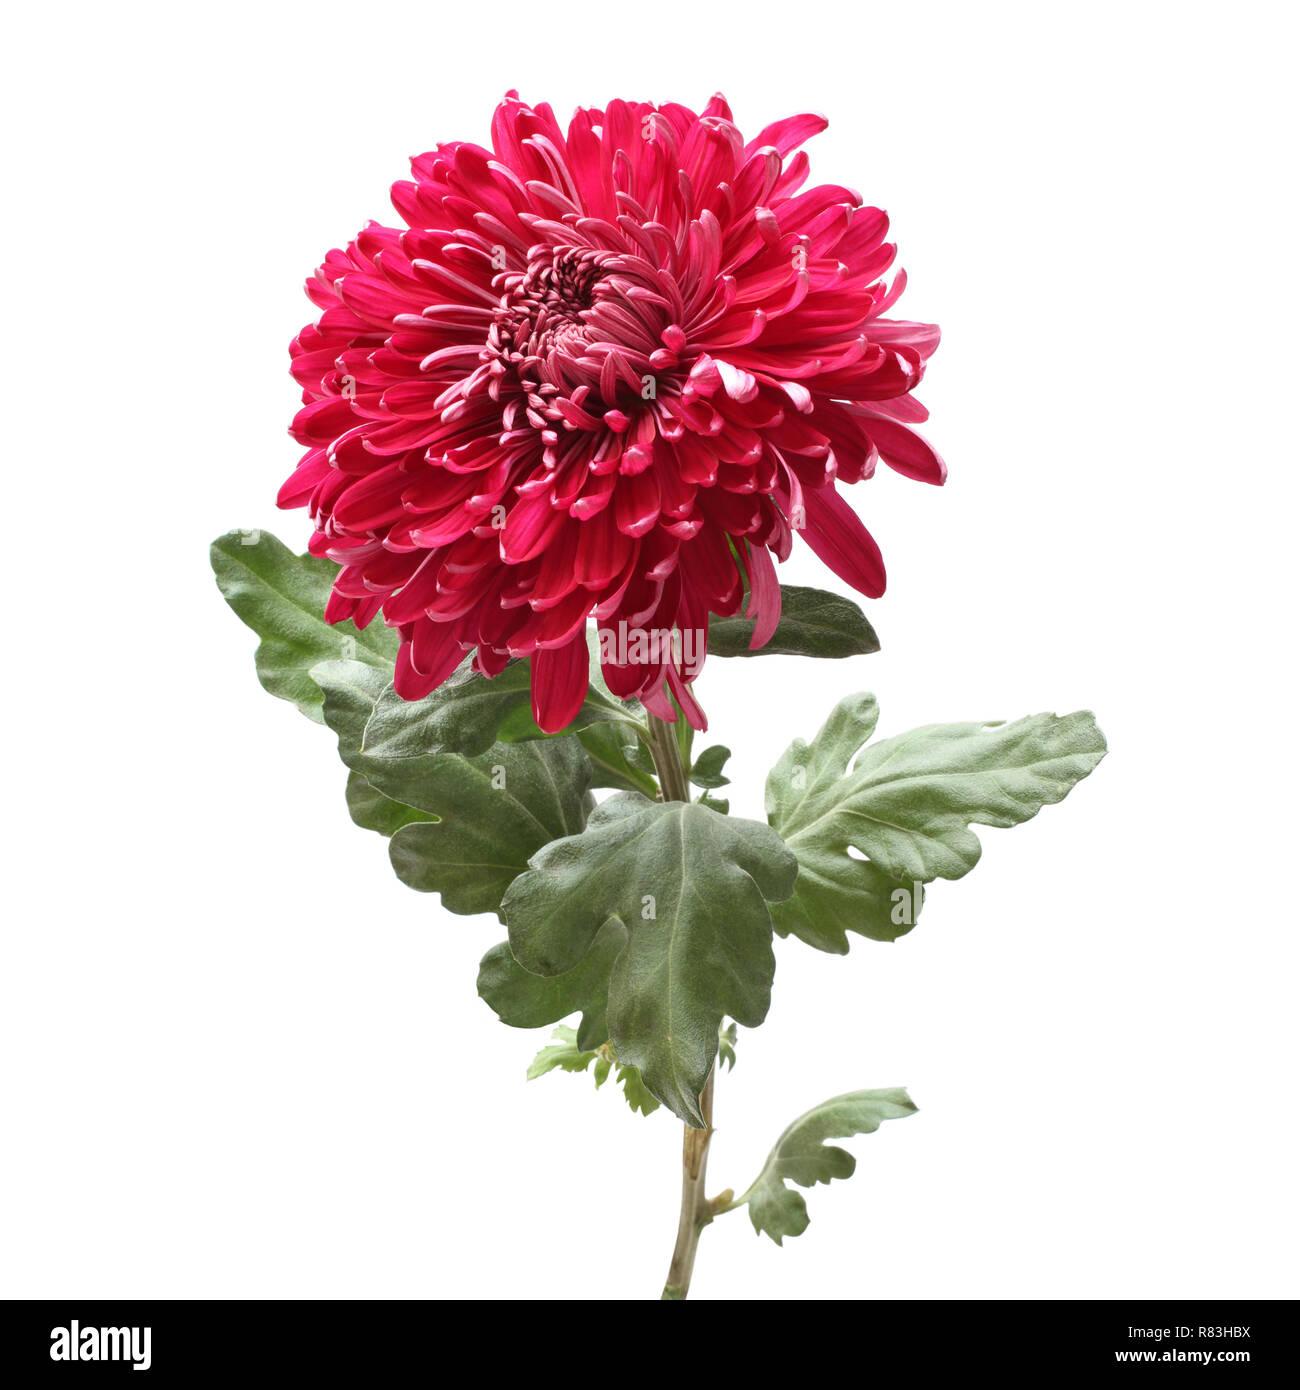 Big magenta chrysanthemum flower isolated on white background Stock Photo